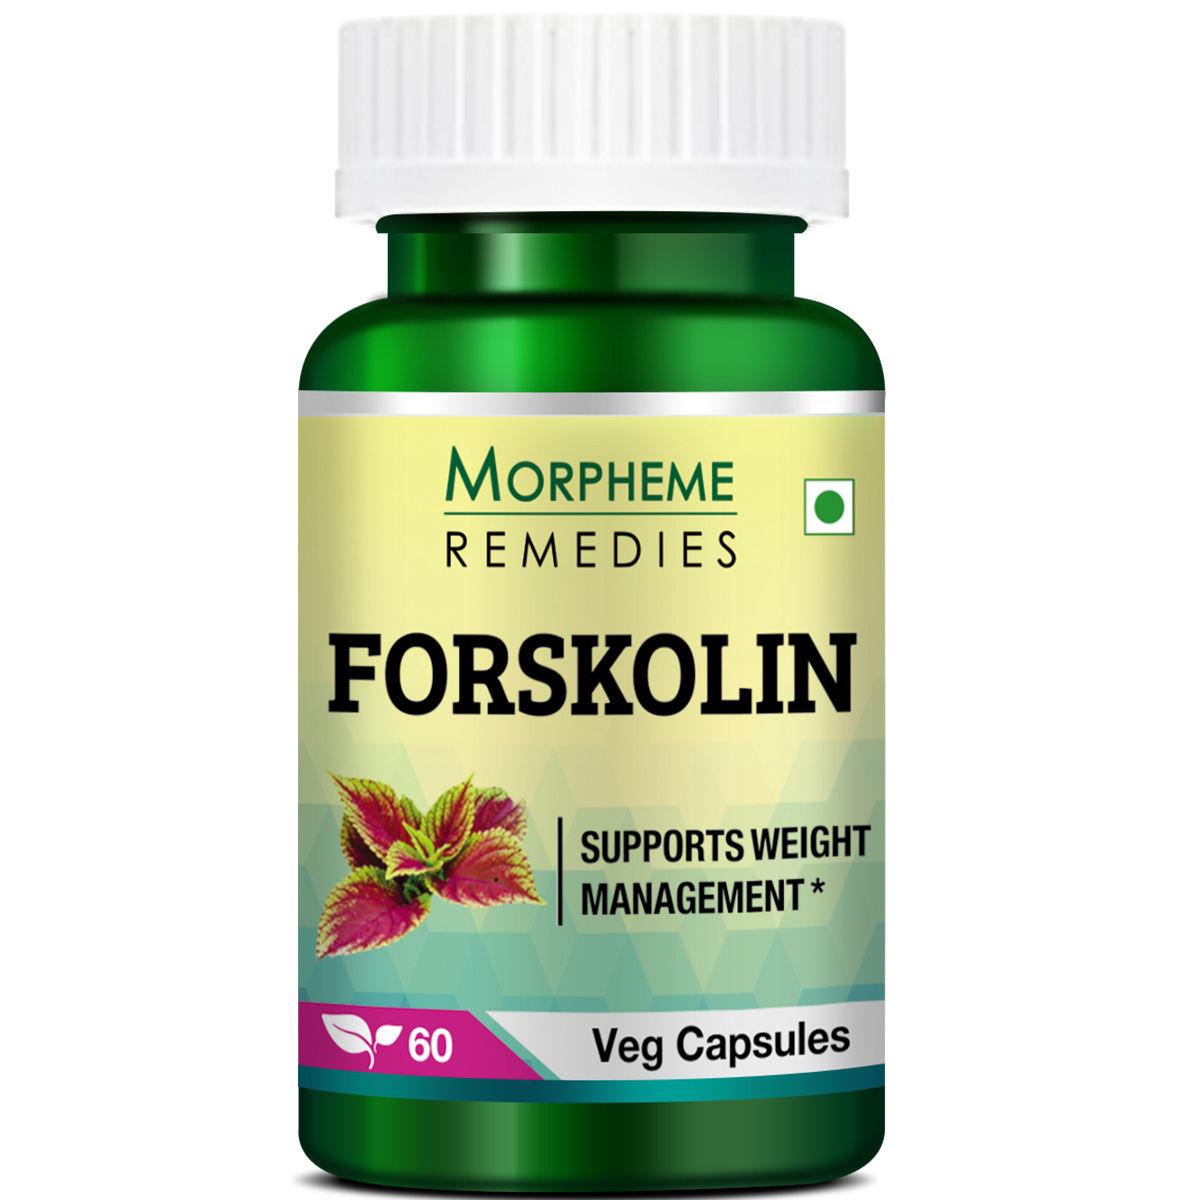 Morpheme Remedies Forskolin - Pure Coleus Forskohlii For Weight Loss & Energy - 500mg Extract